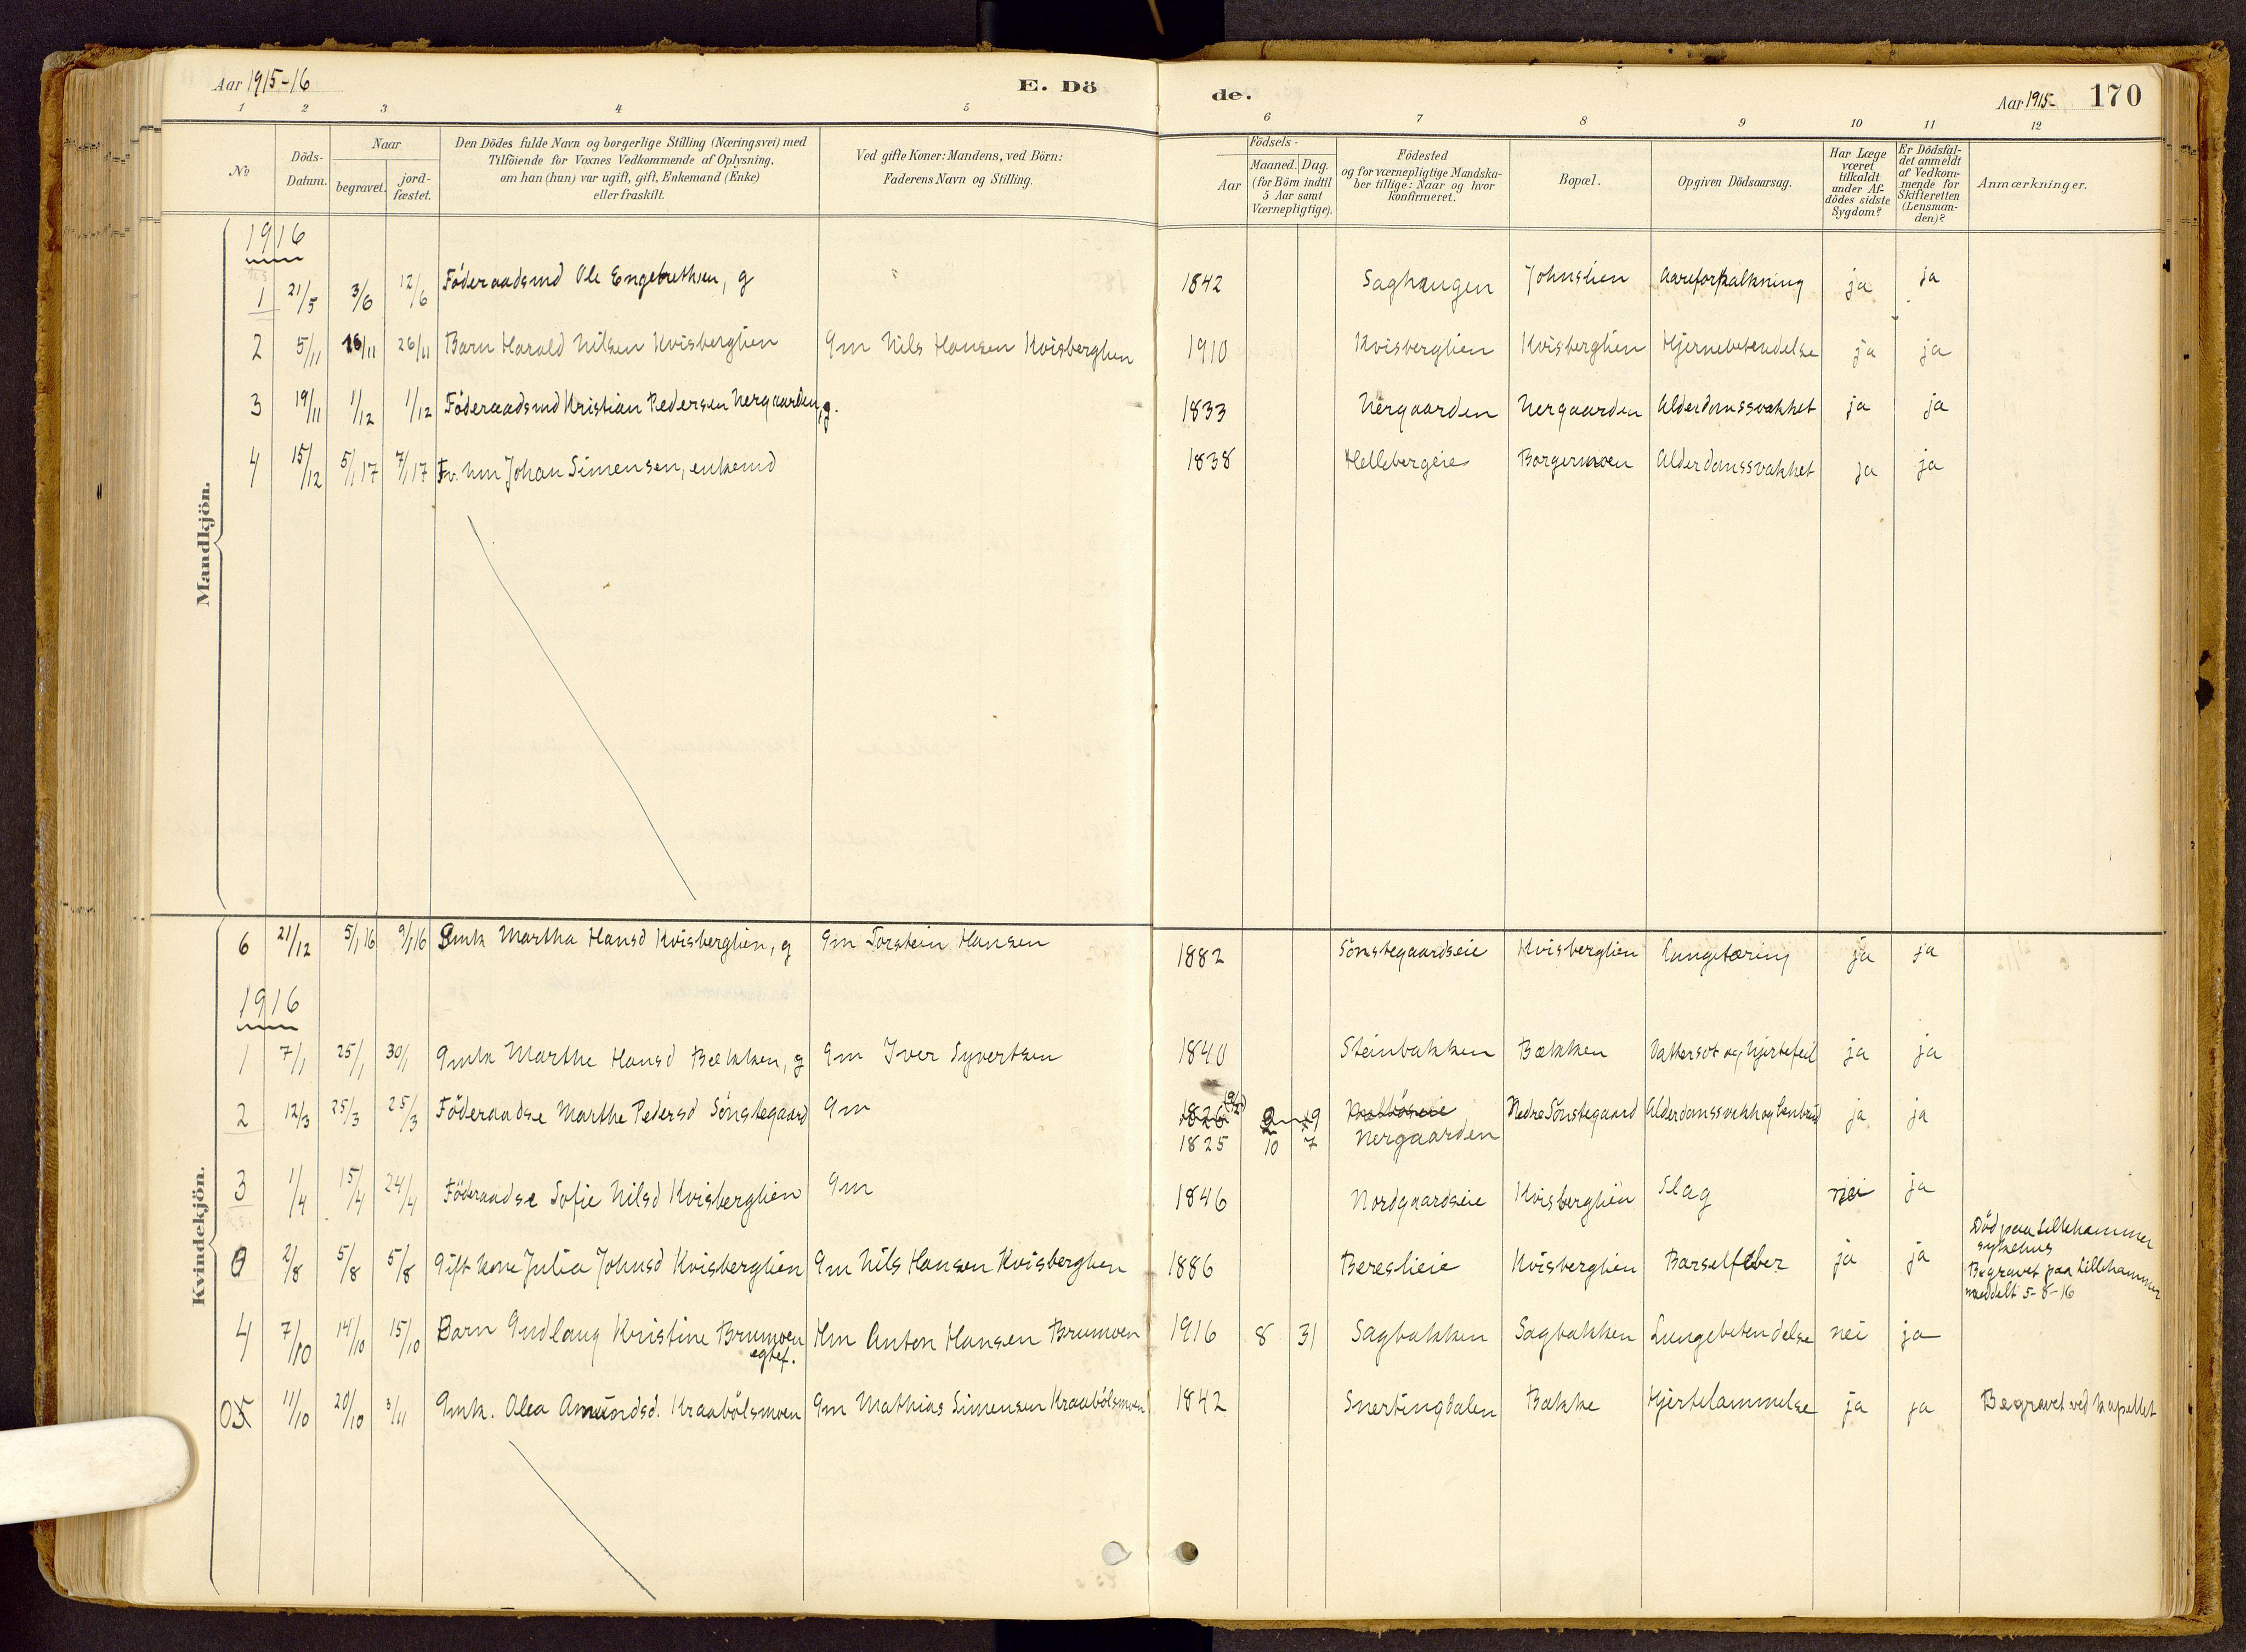 SAH, Vestre Gausdal prestekontor, Ministerialbok nr. 2, 1887-1918, s. 170